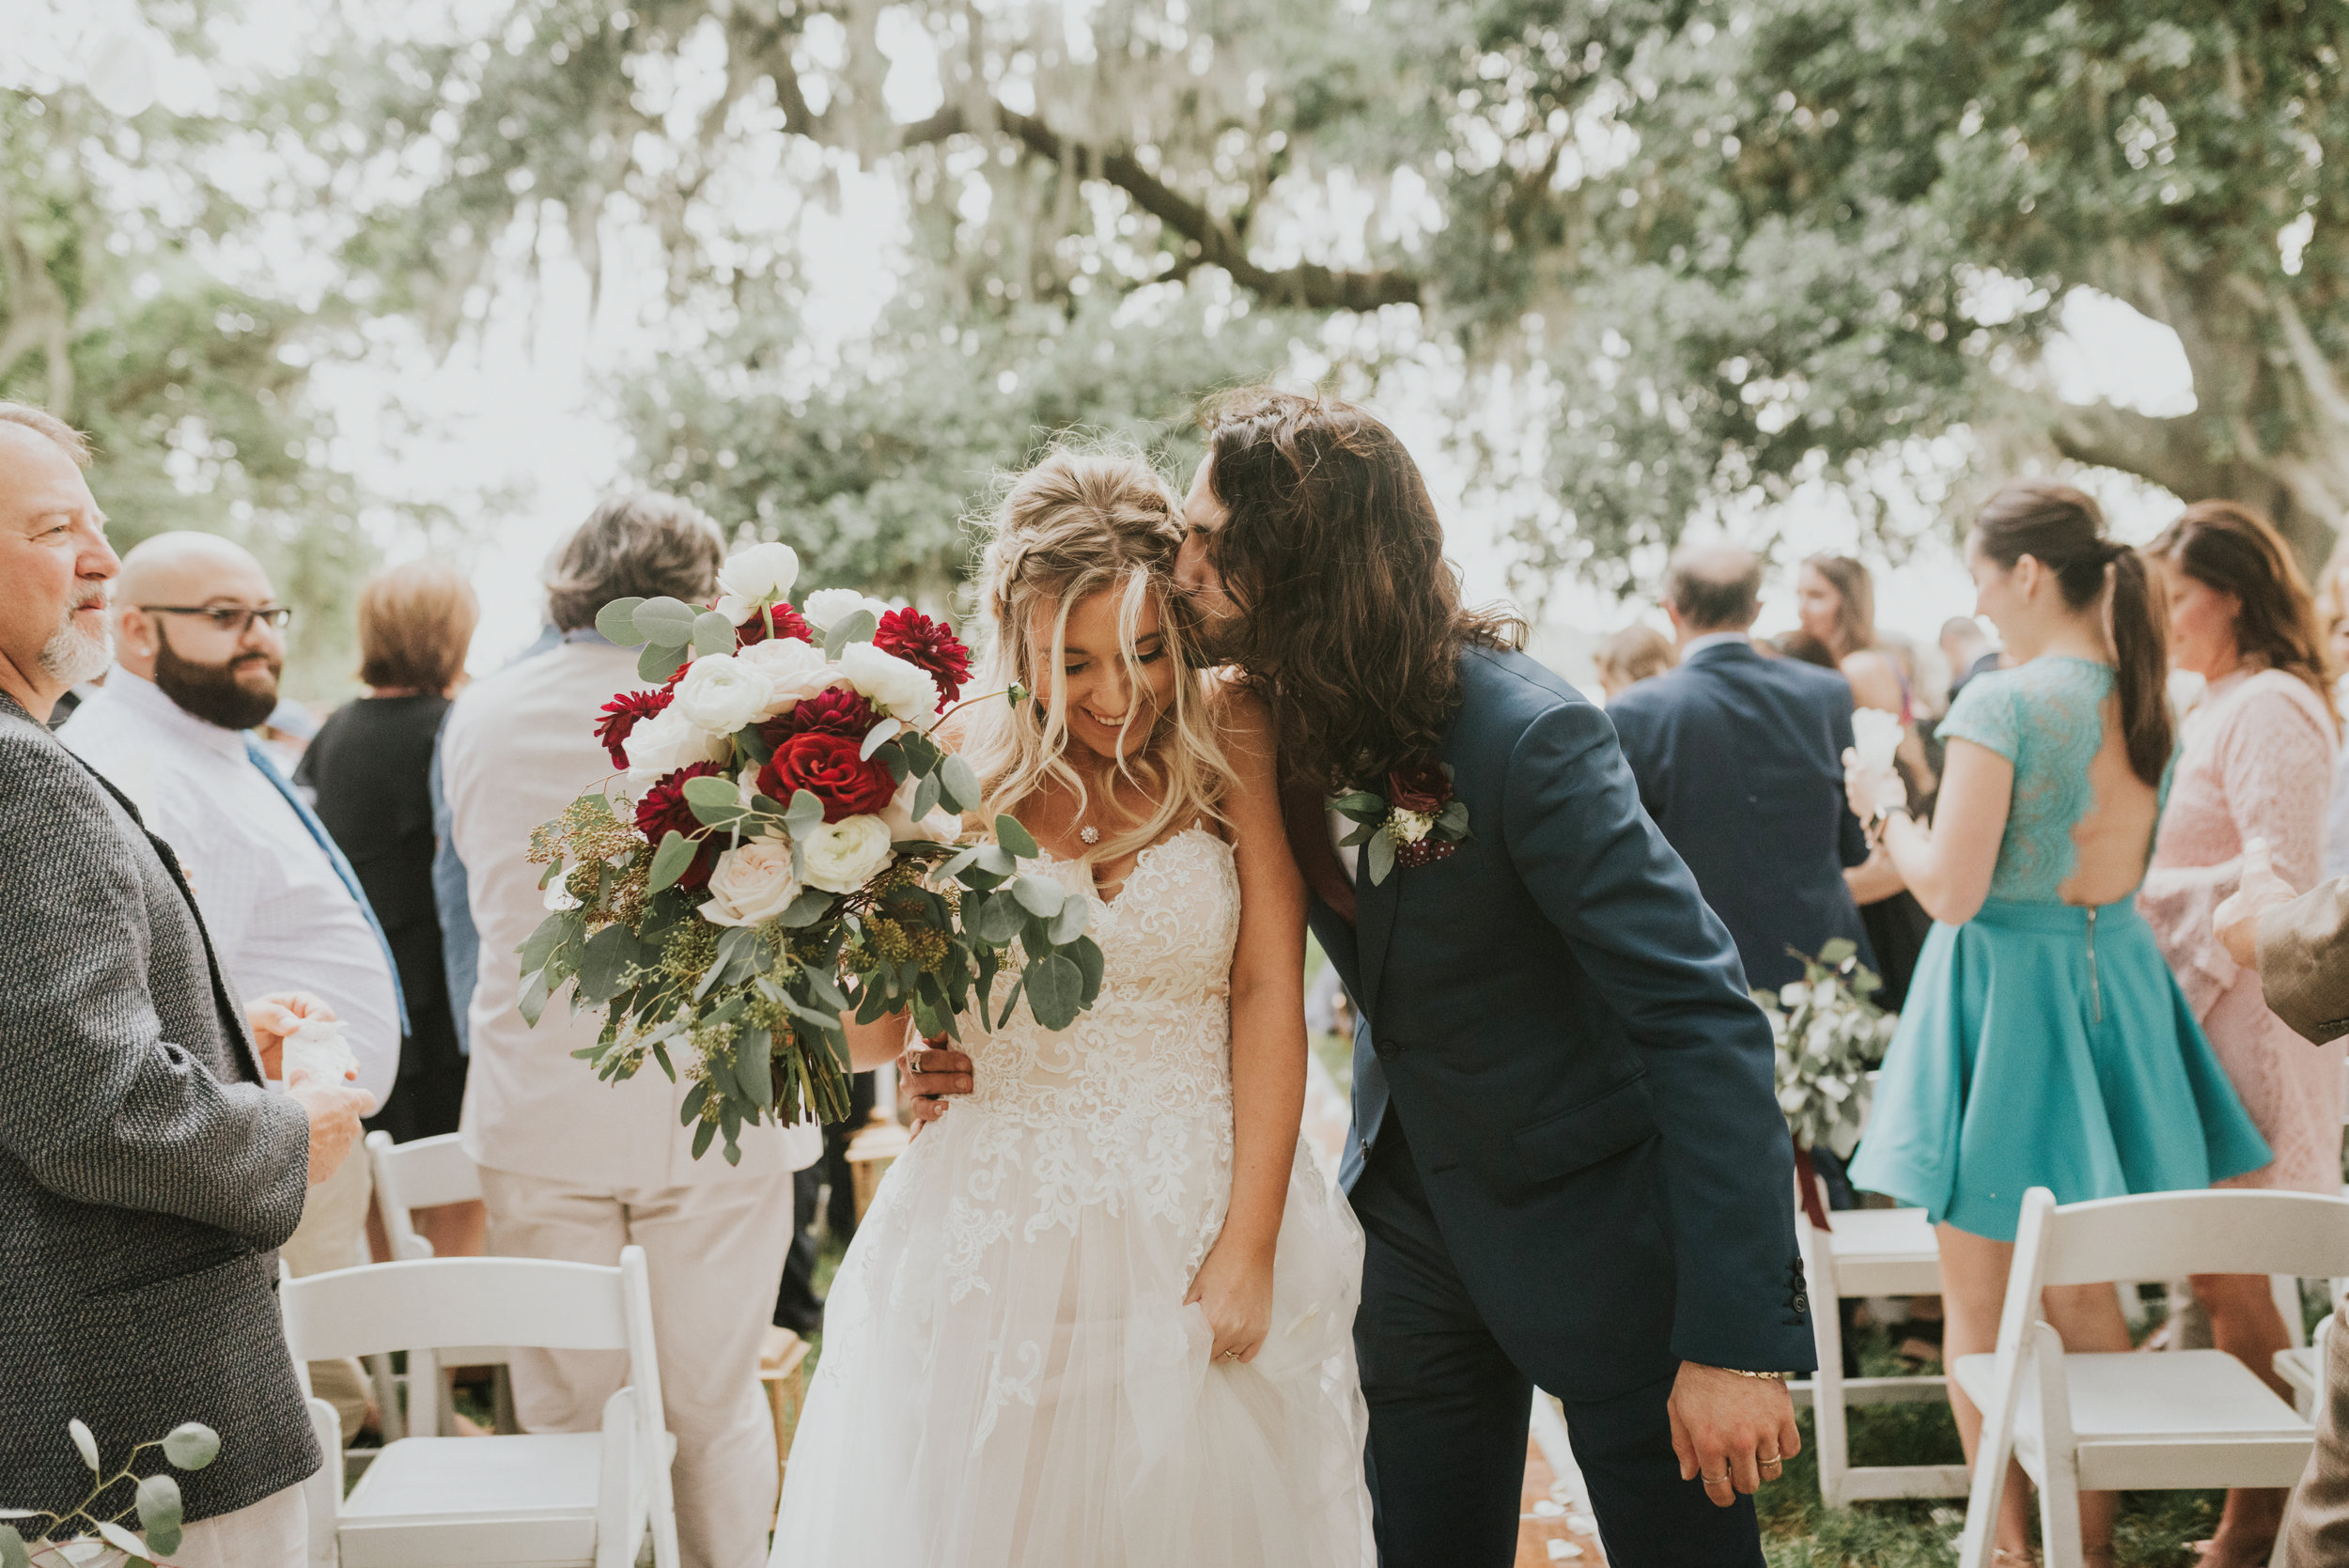 Southern Fete, Southern Wedding, Bride and Groom, Rip Van Winkle Gardens, Jen Menard Photo